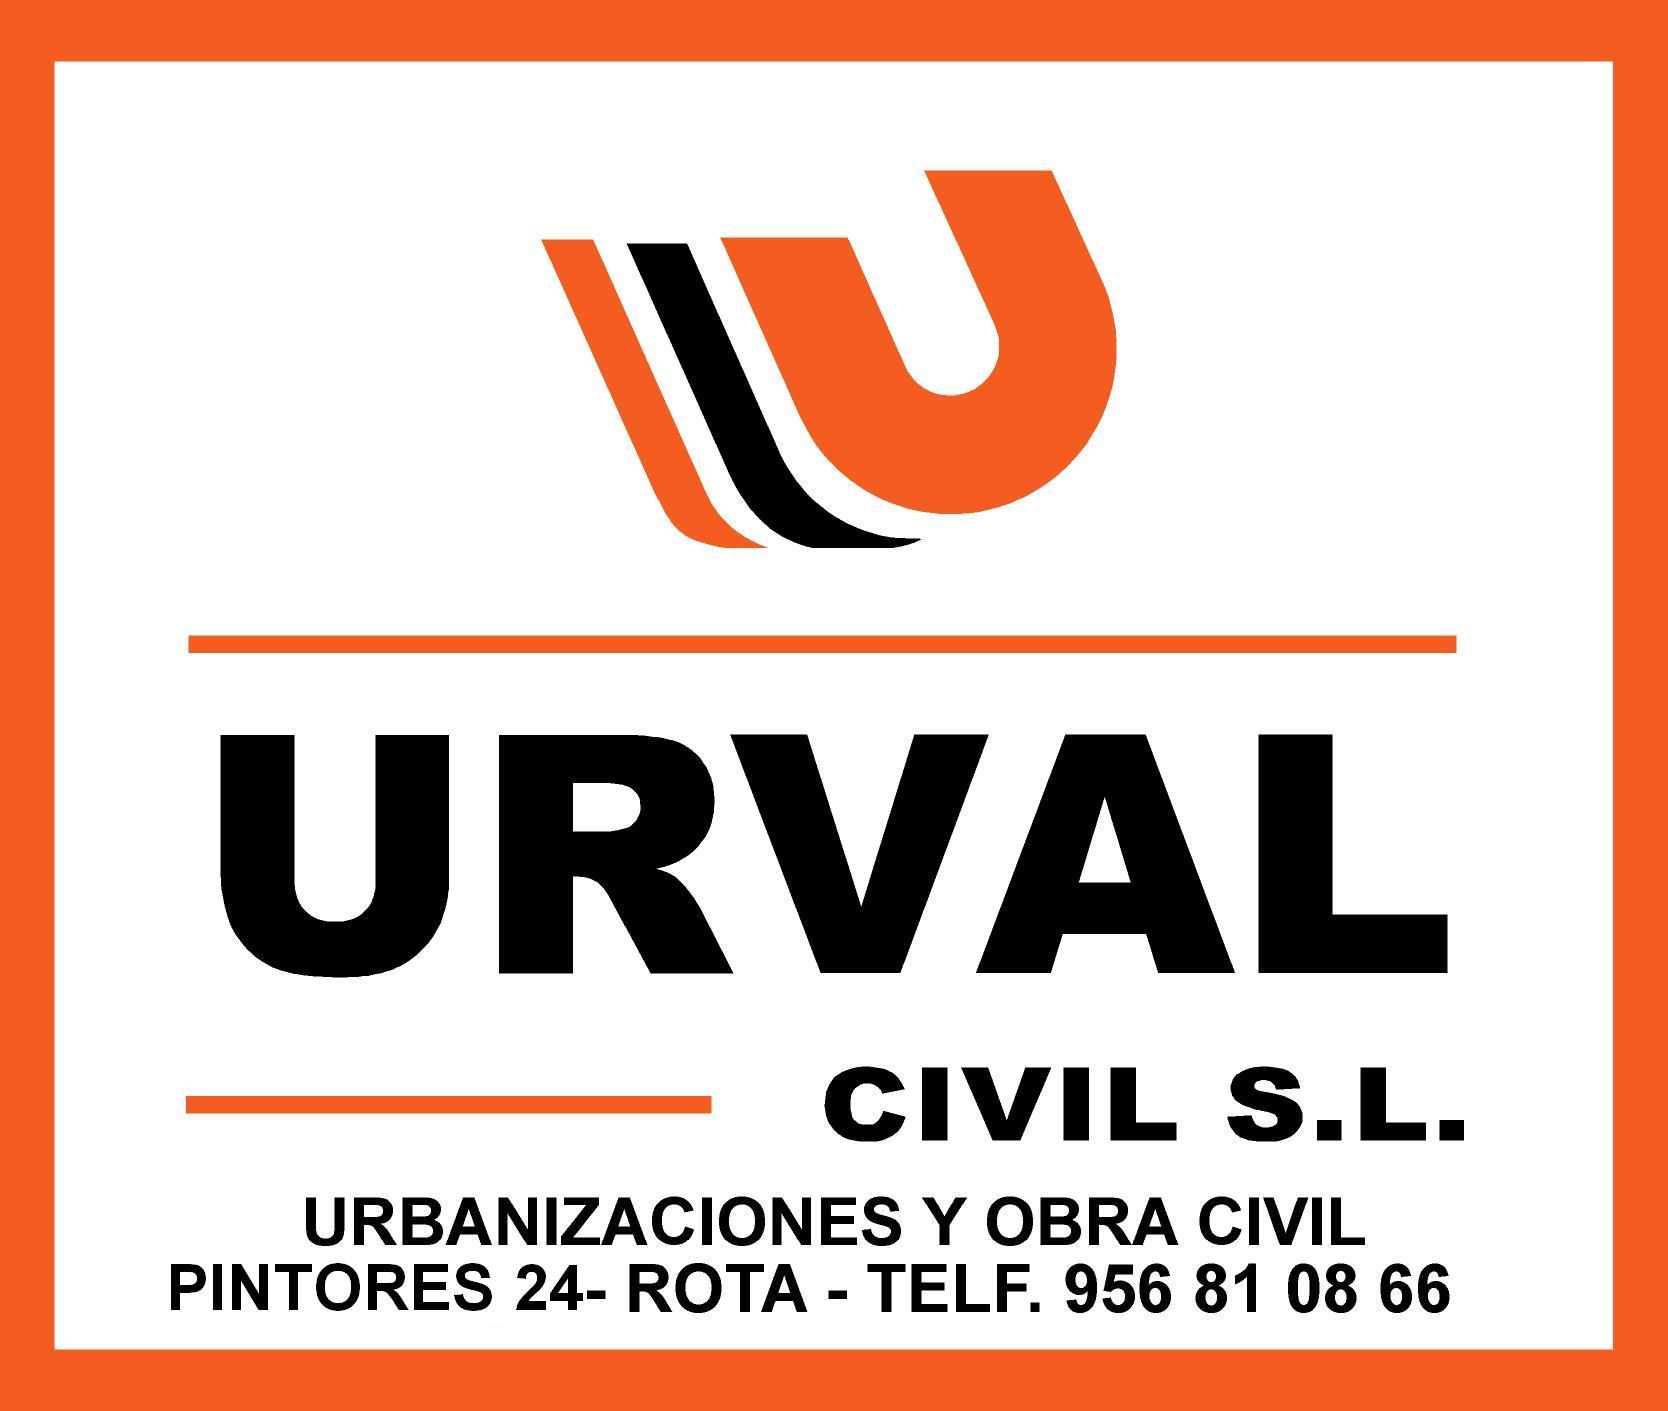 Urval Civil